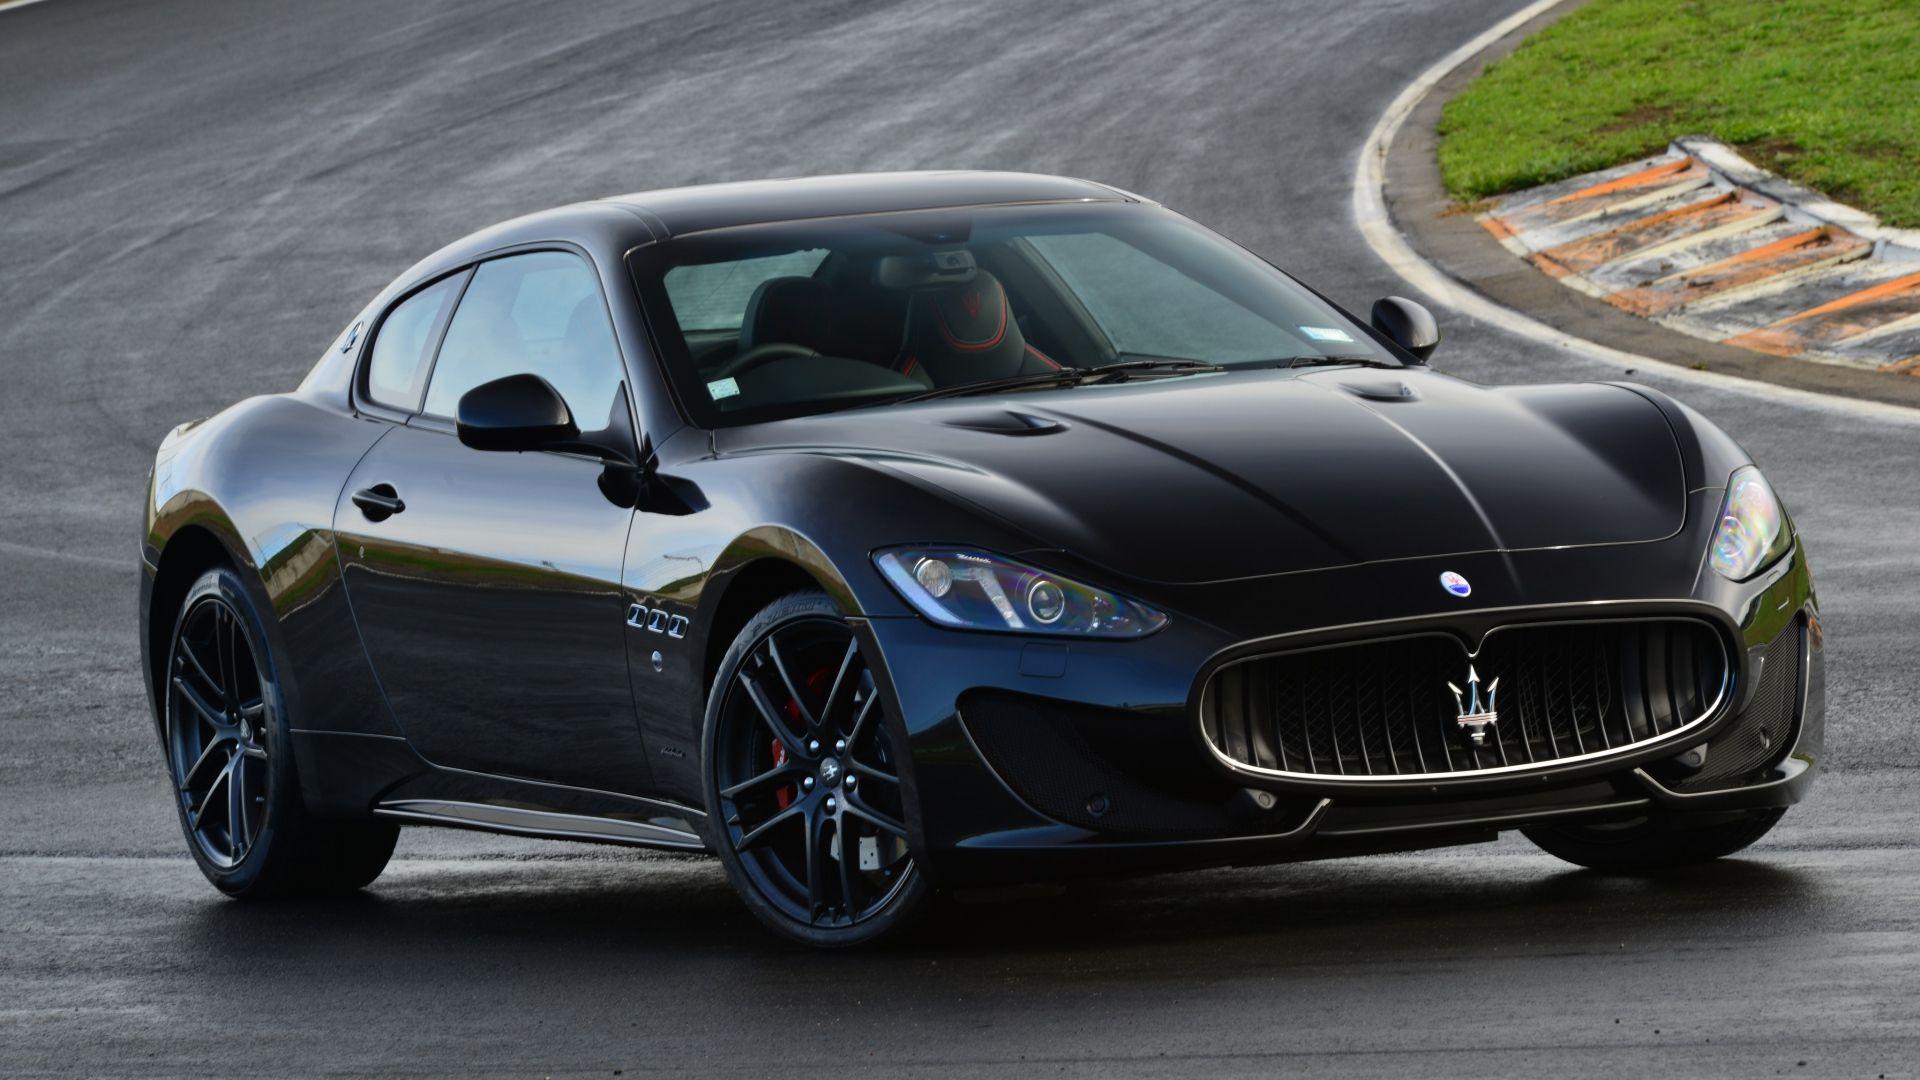 Maserati Gran Turismo Wallpapers Wallpapers 2020 Maserati